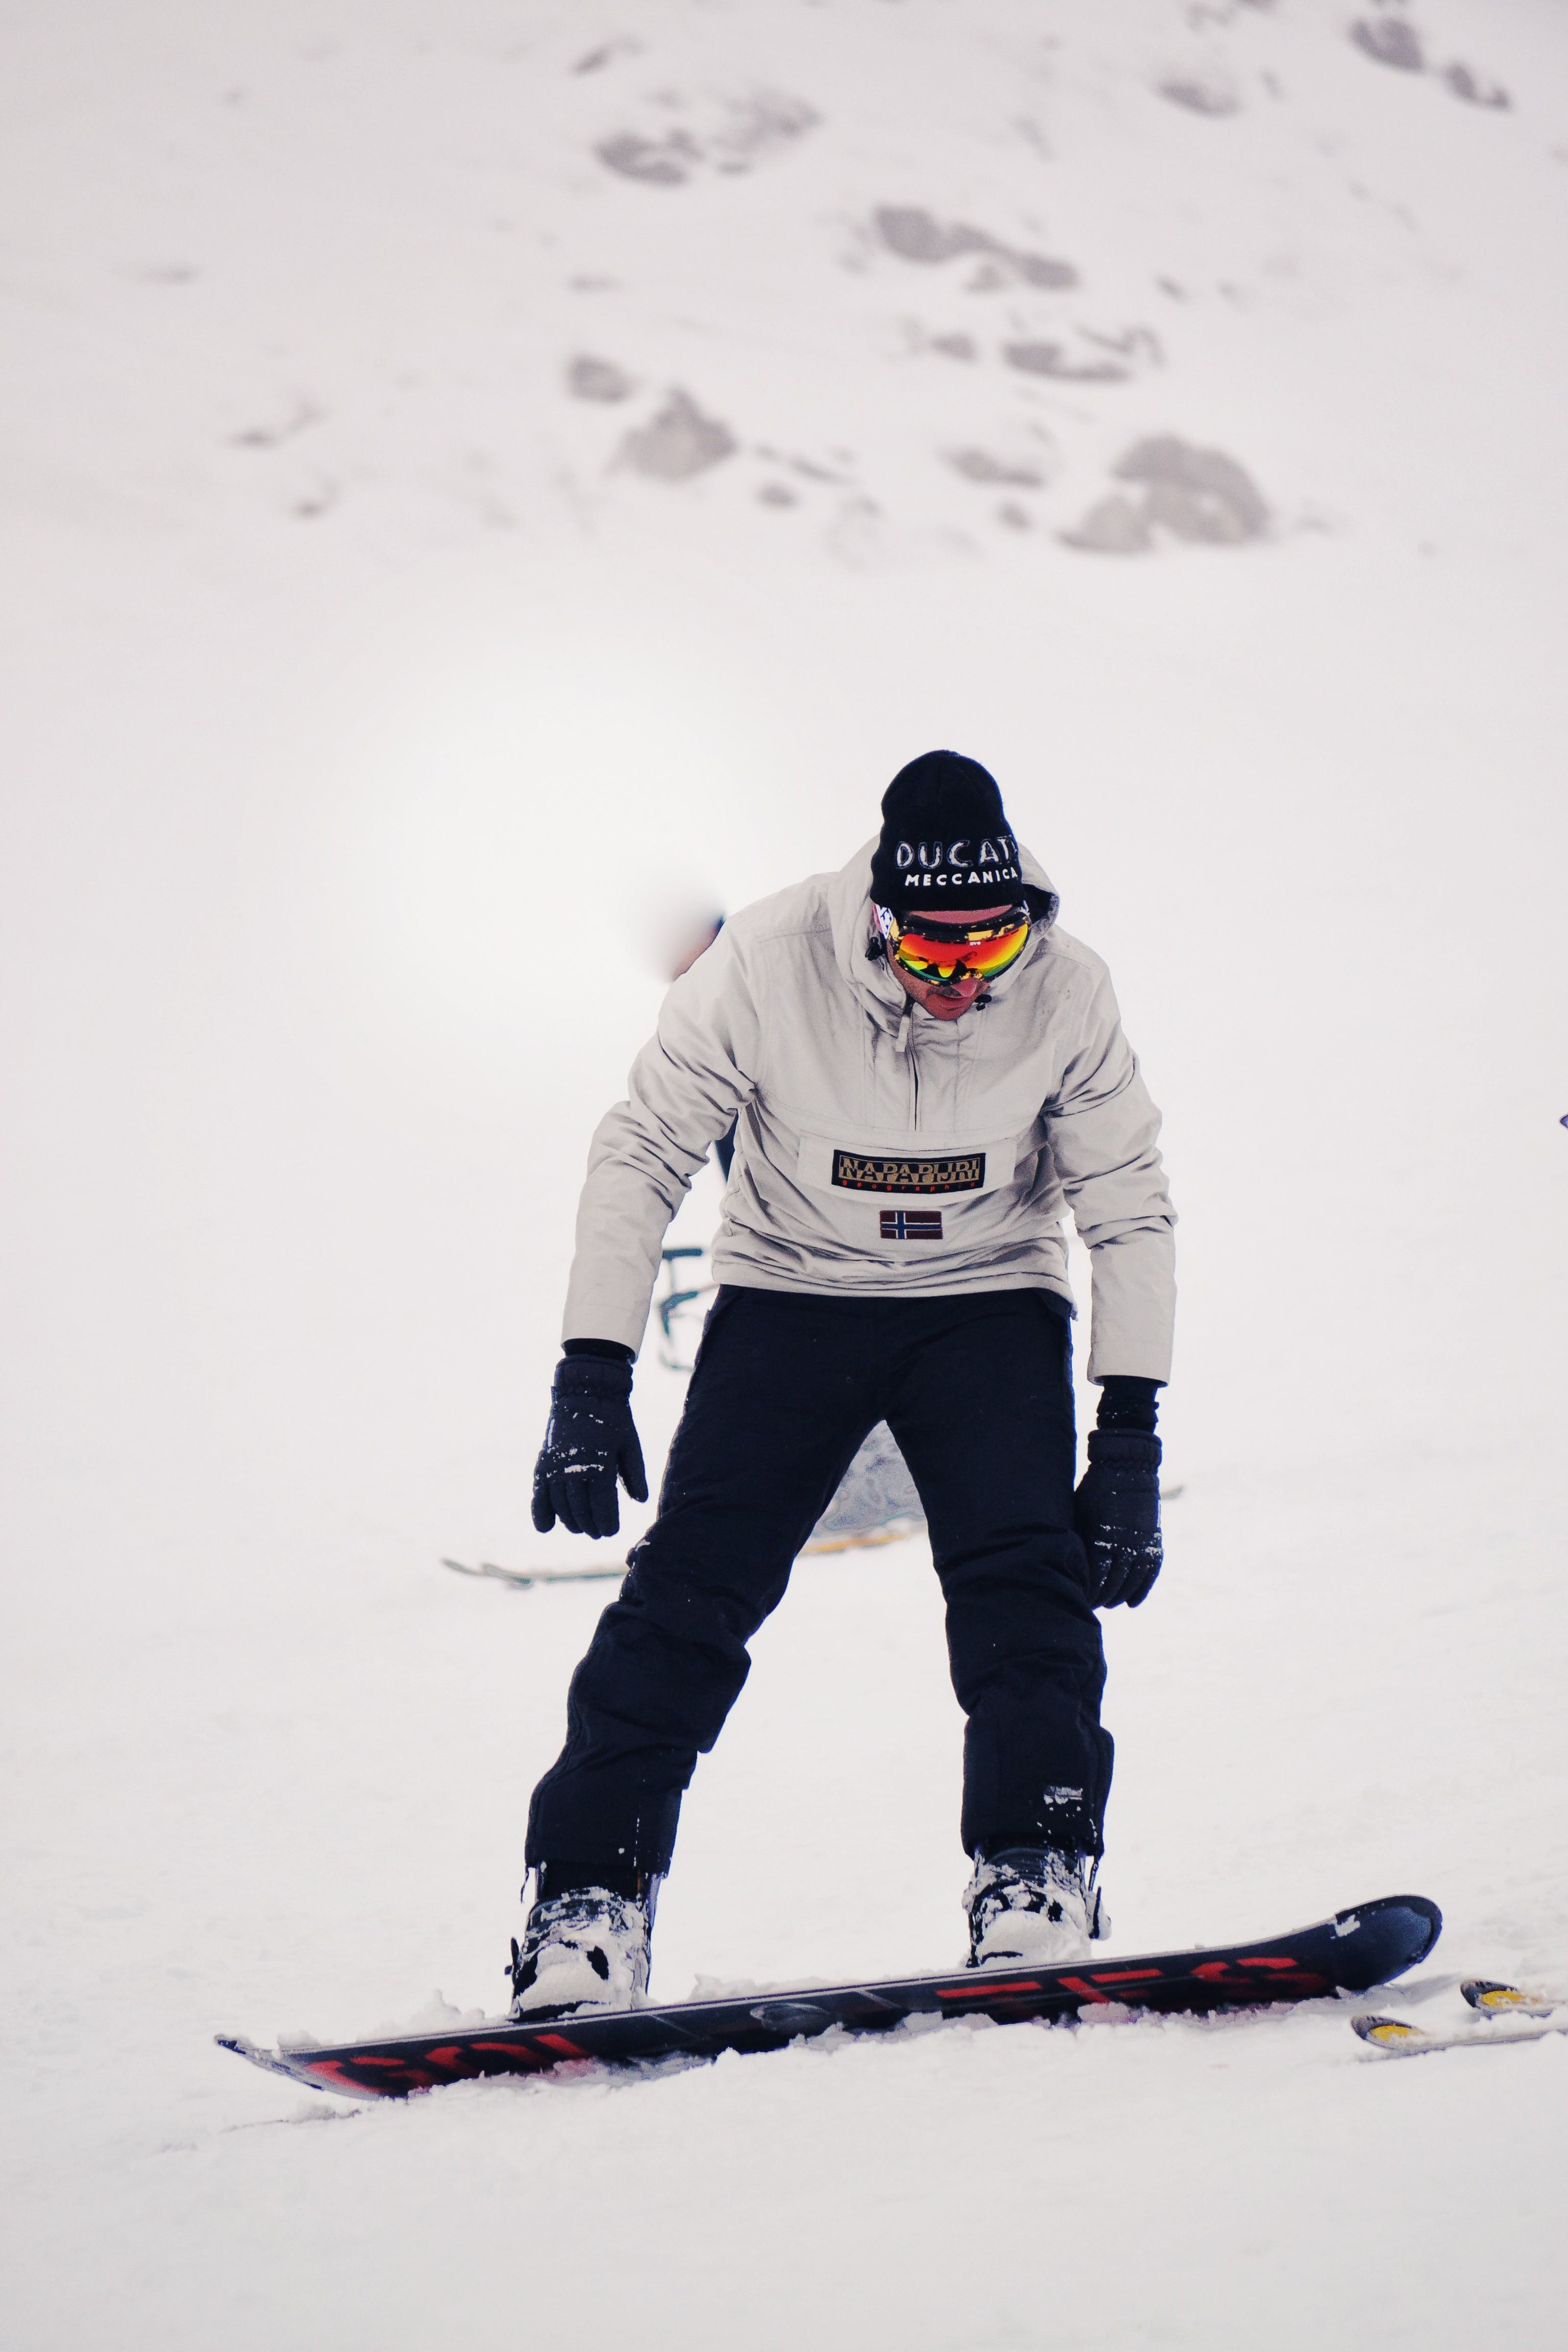 Free stock photo of cold, snow, man, winter